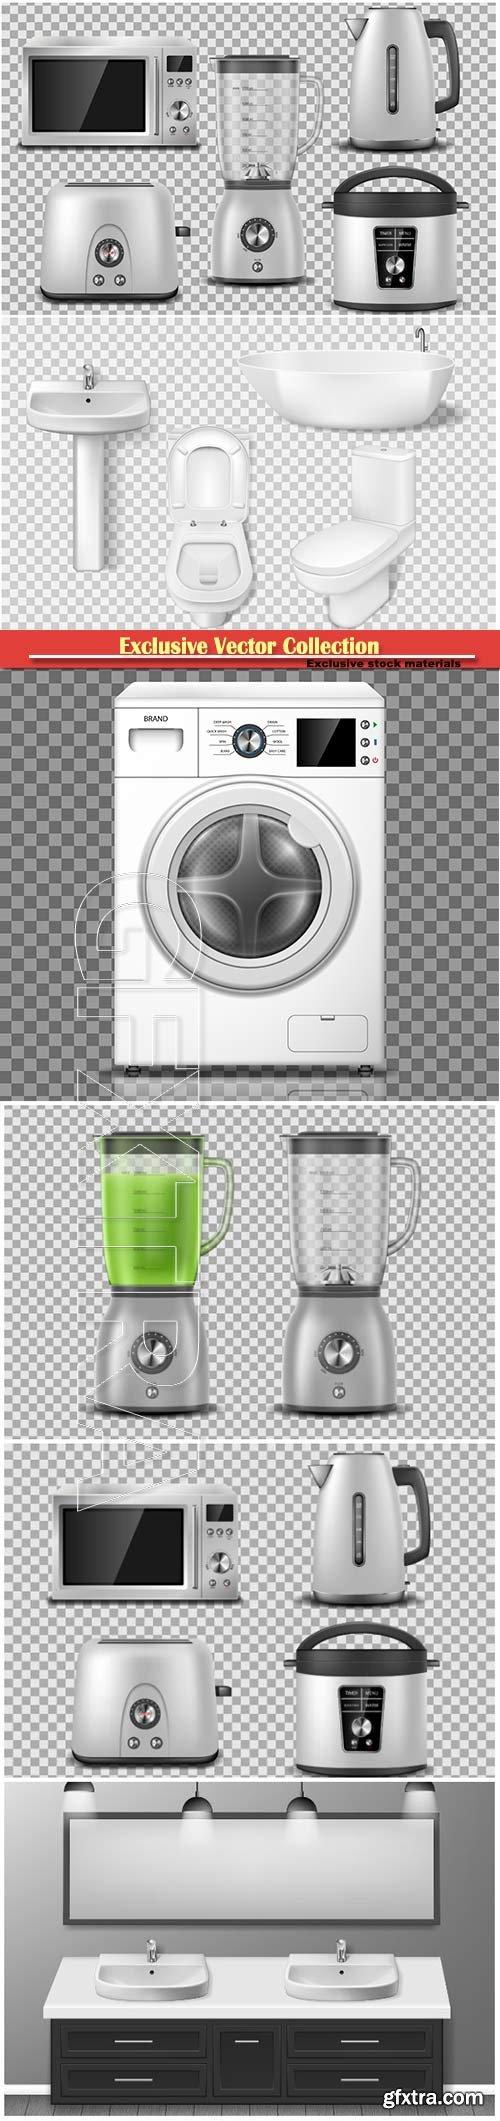 Set of household appliance, kitchen, bathroom appliances,  vector illustration